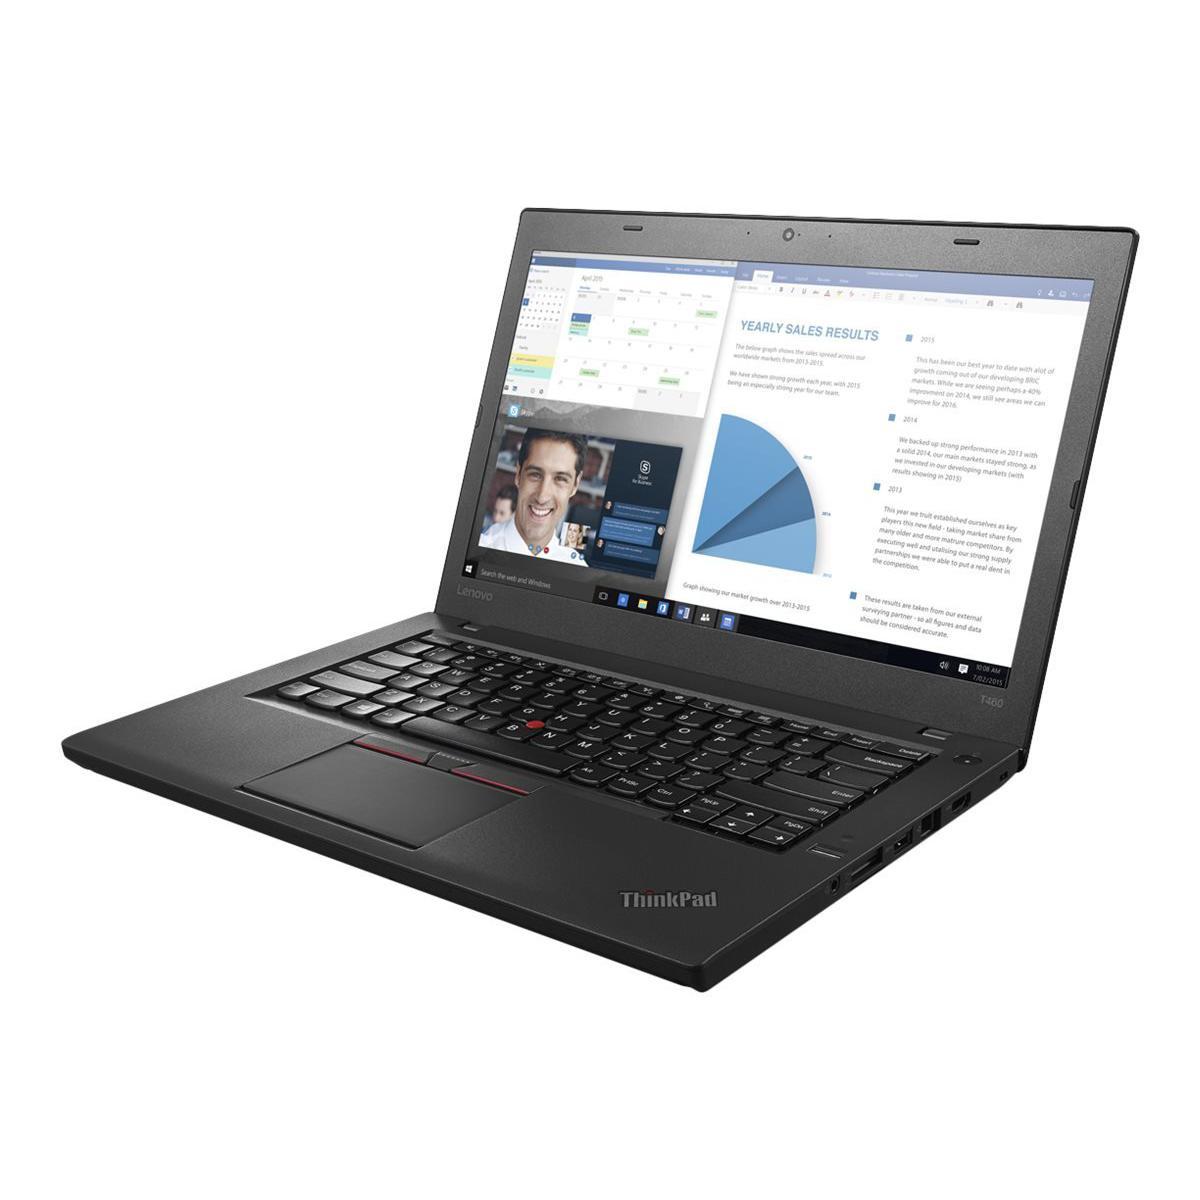 Lenovo ThinkPad T460 14-inch (2016) - Core i5-6300U - 8 GB  - SSD 180 GB